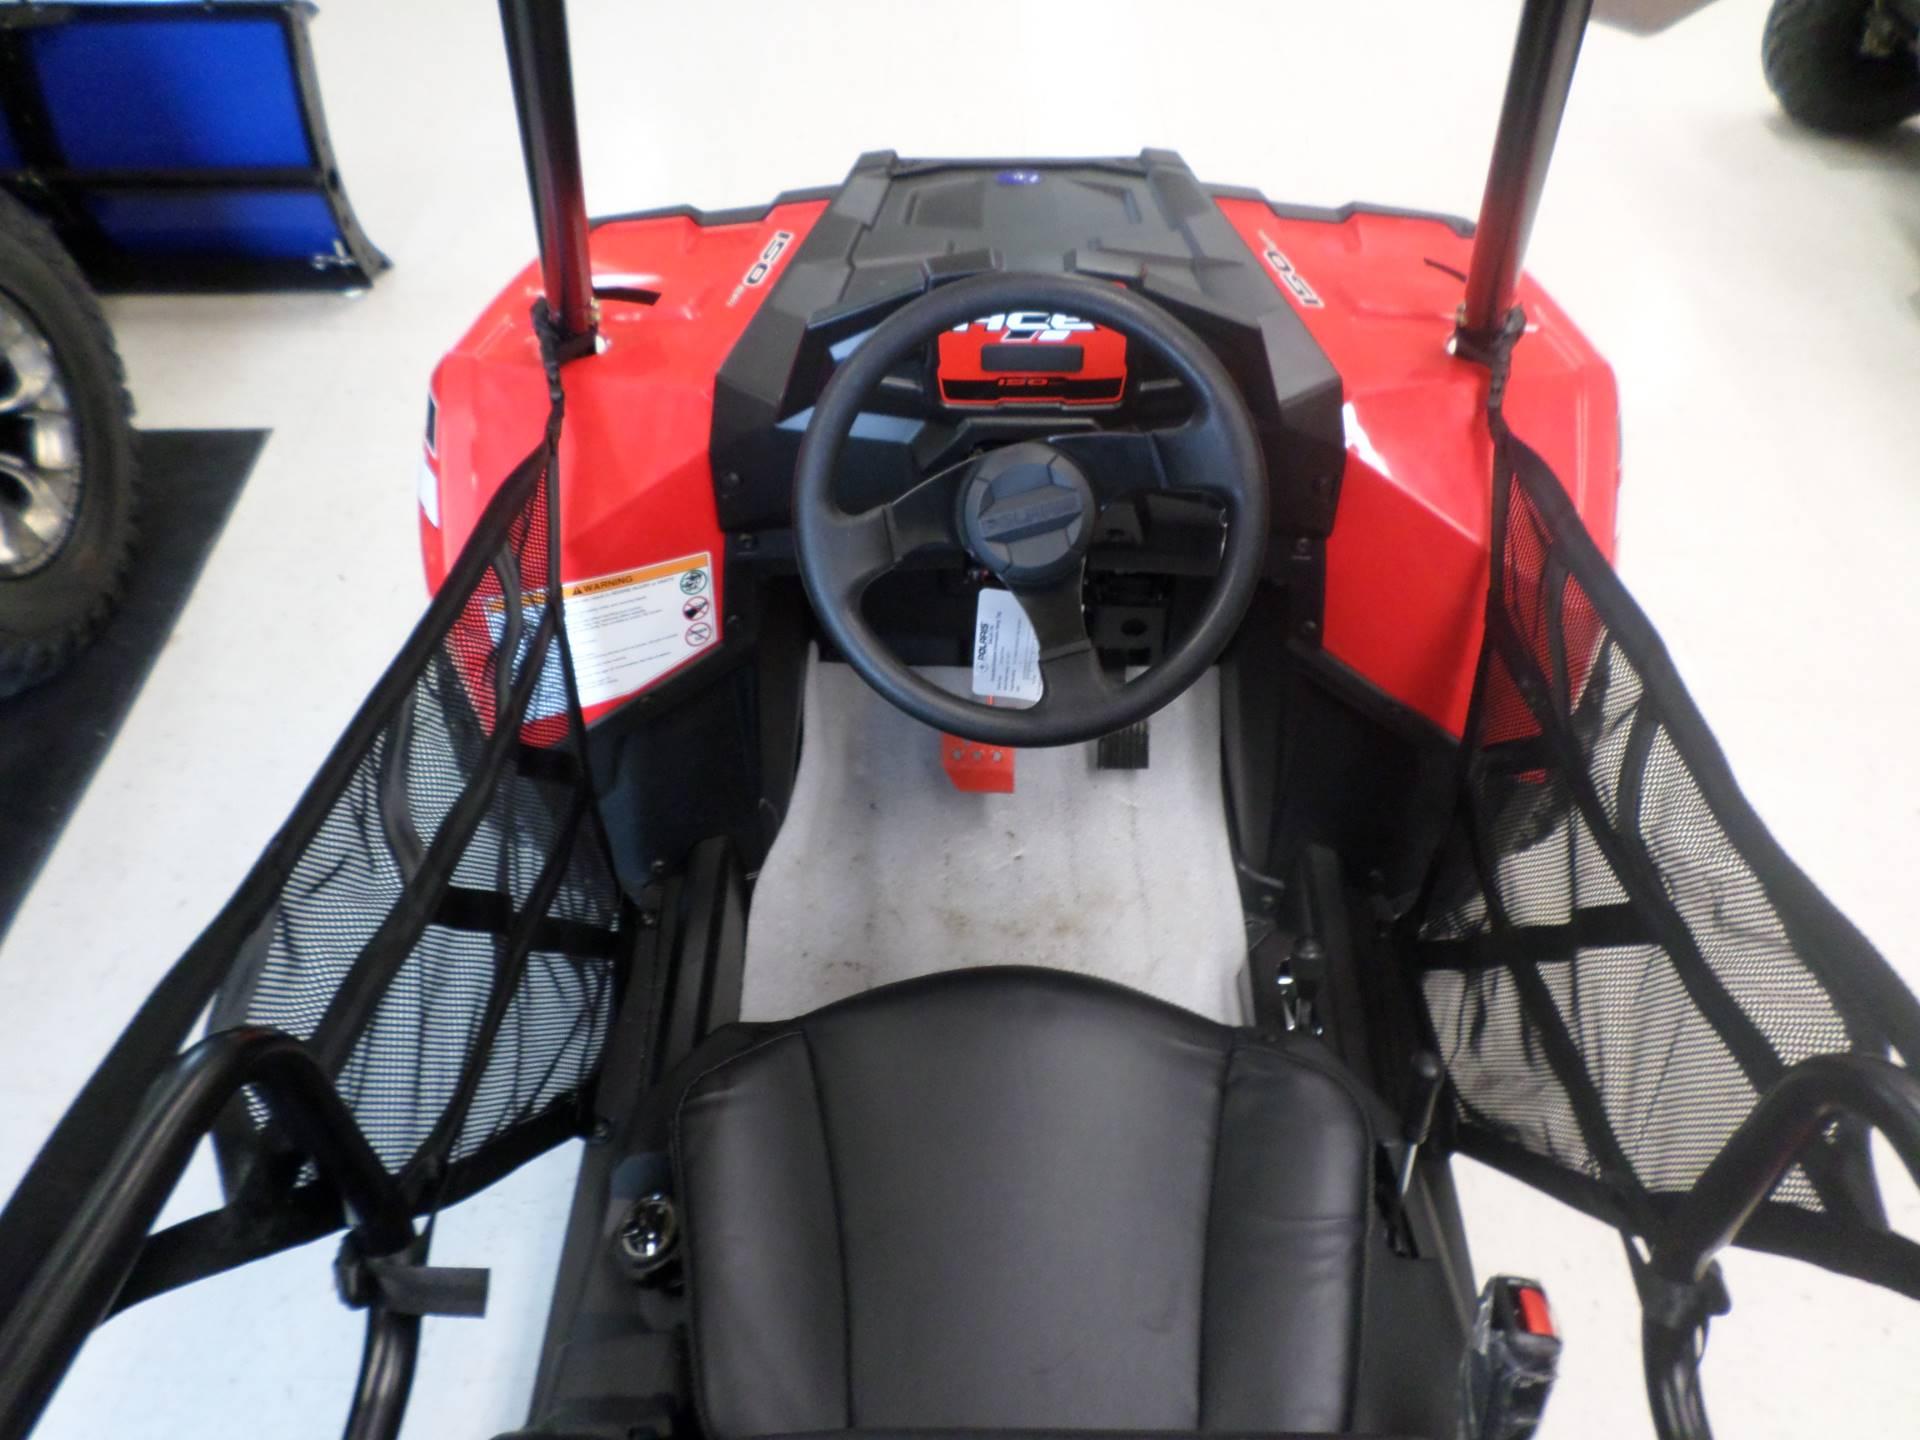 2017 Polaris Ace 150 EFI 4